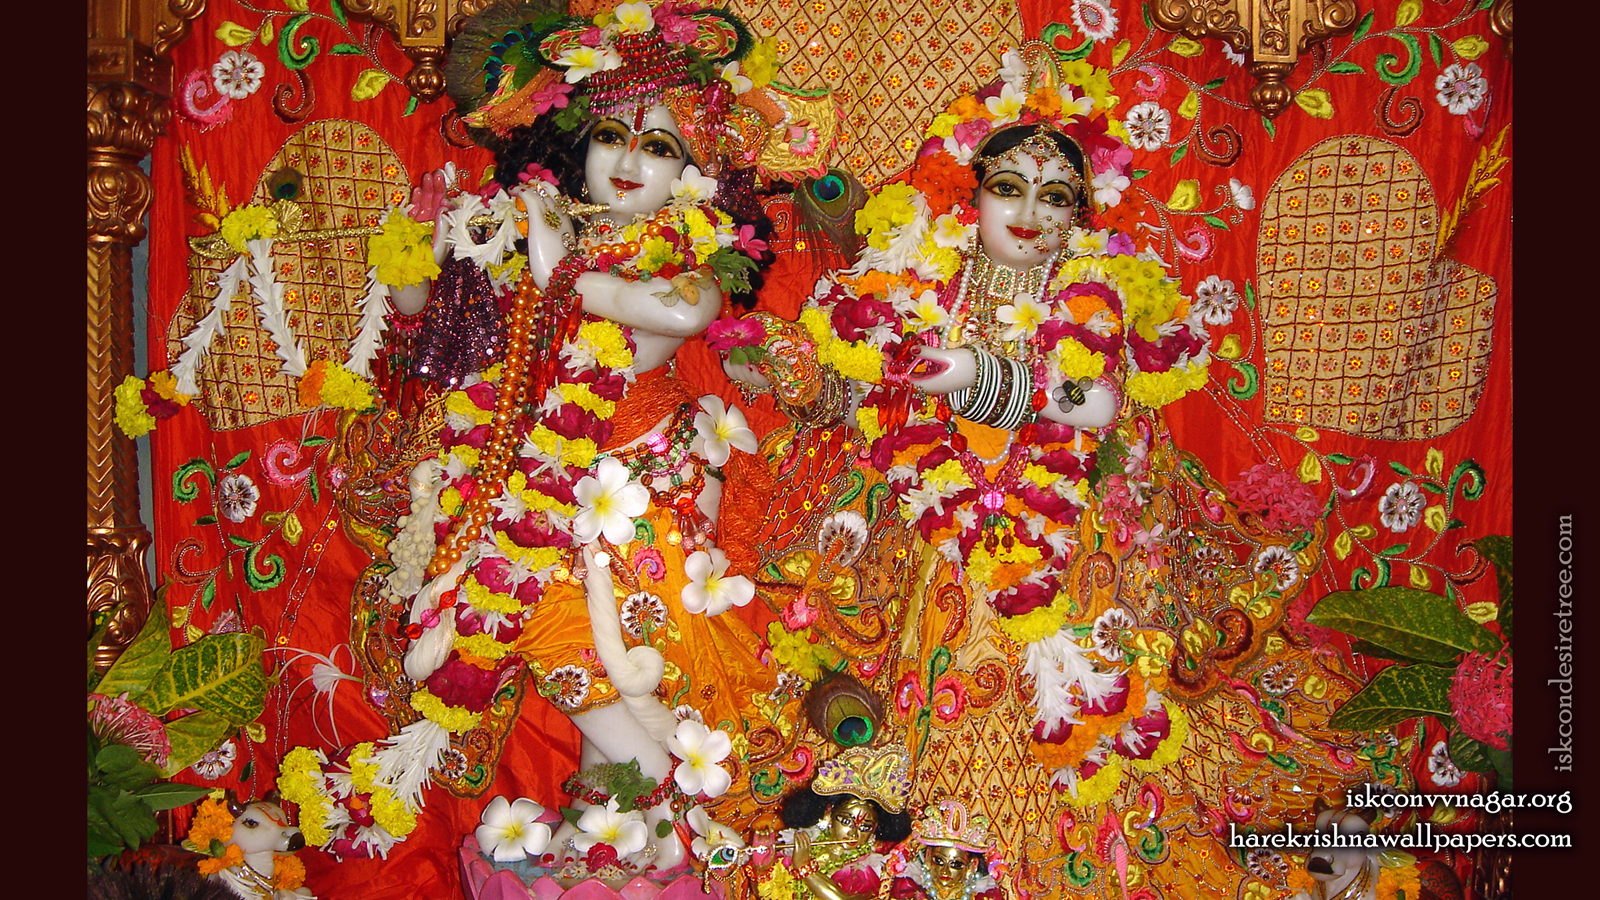 Sri Sri Radha Giridhari Wallpaper (028) Size 1600x900 Download